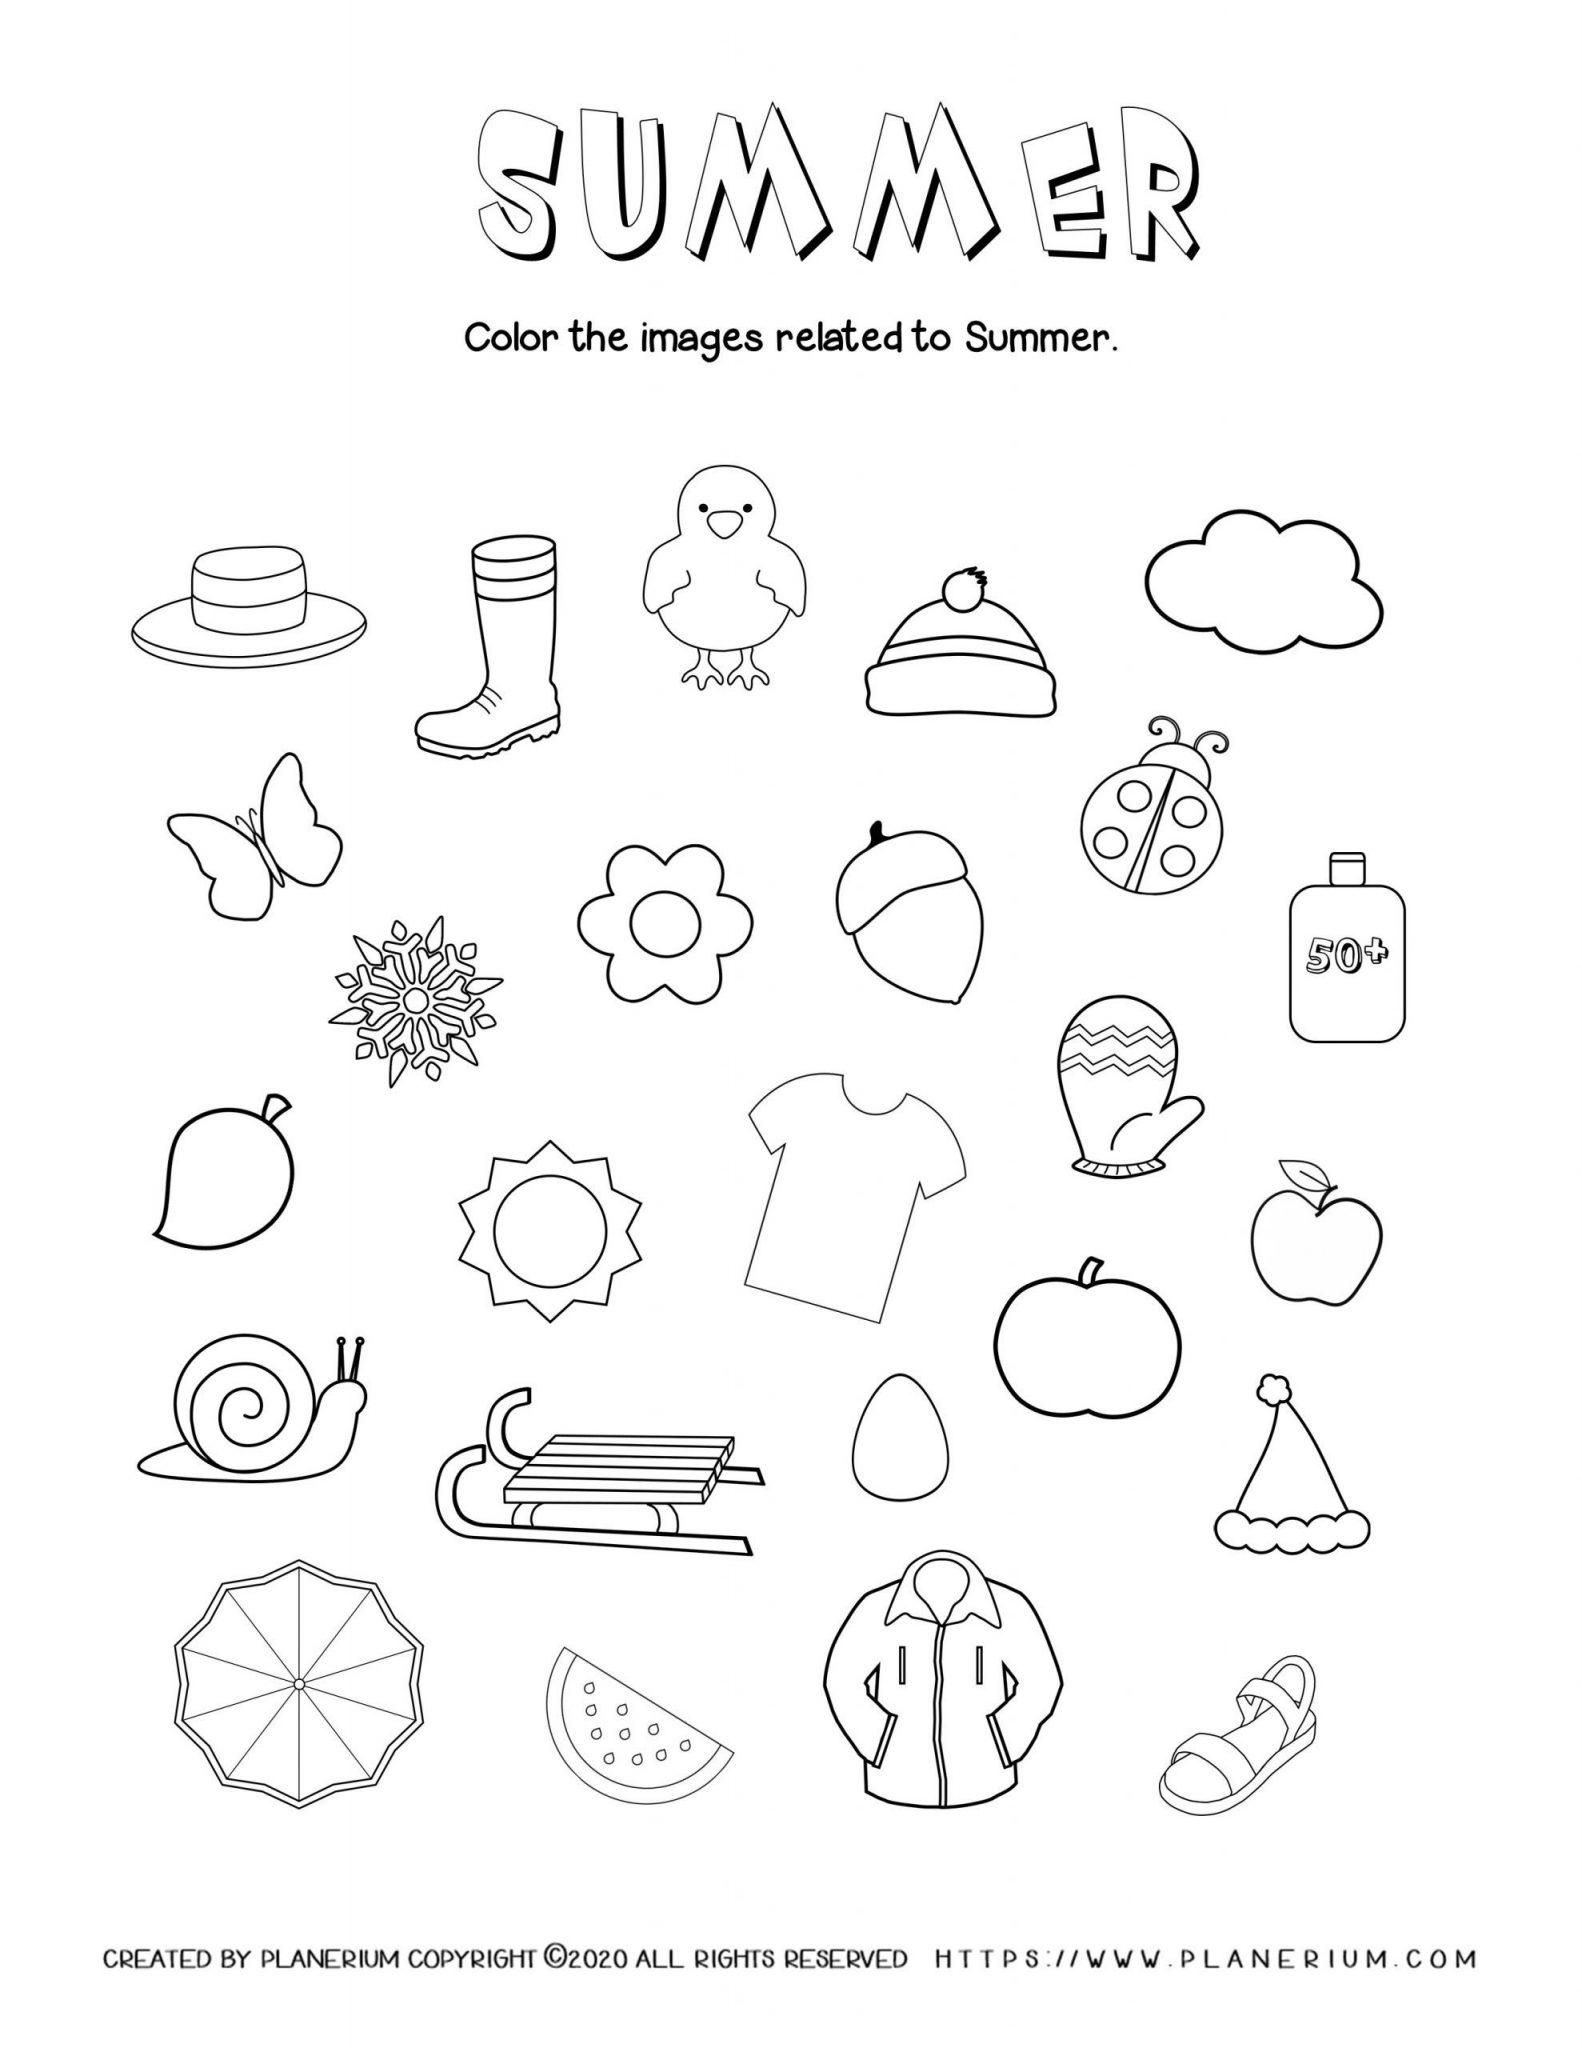 Summer - Worksheet - Summer related items